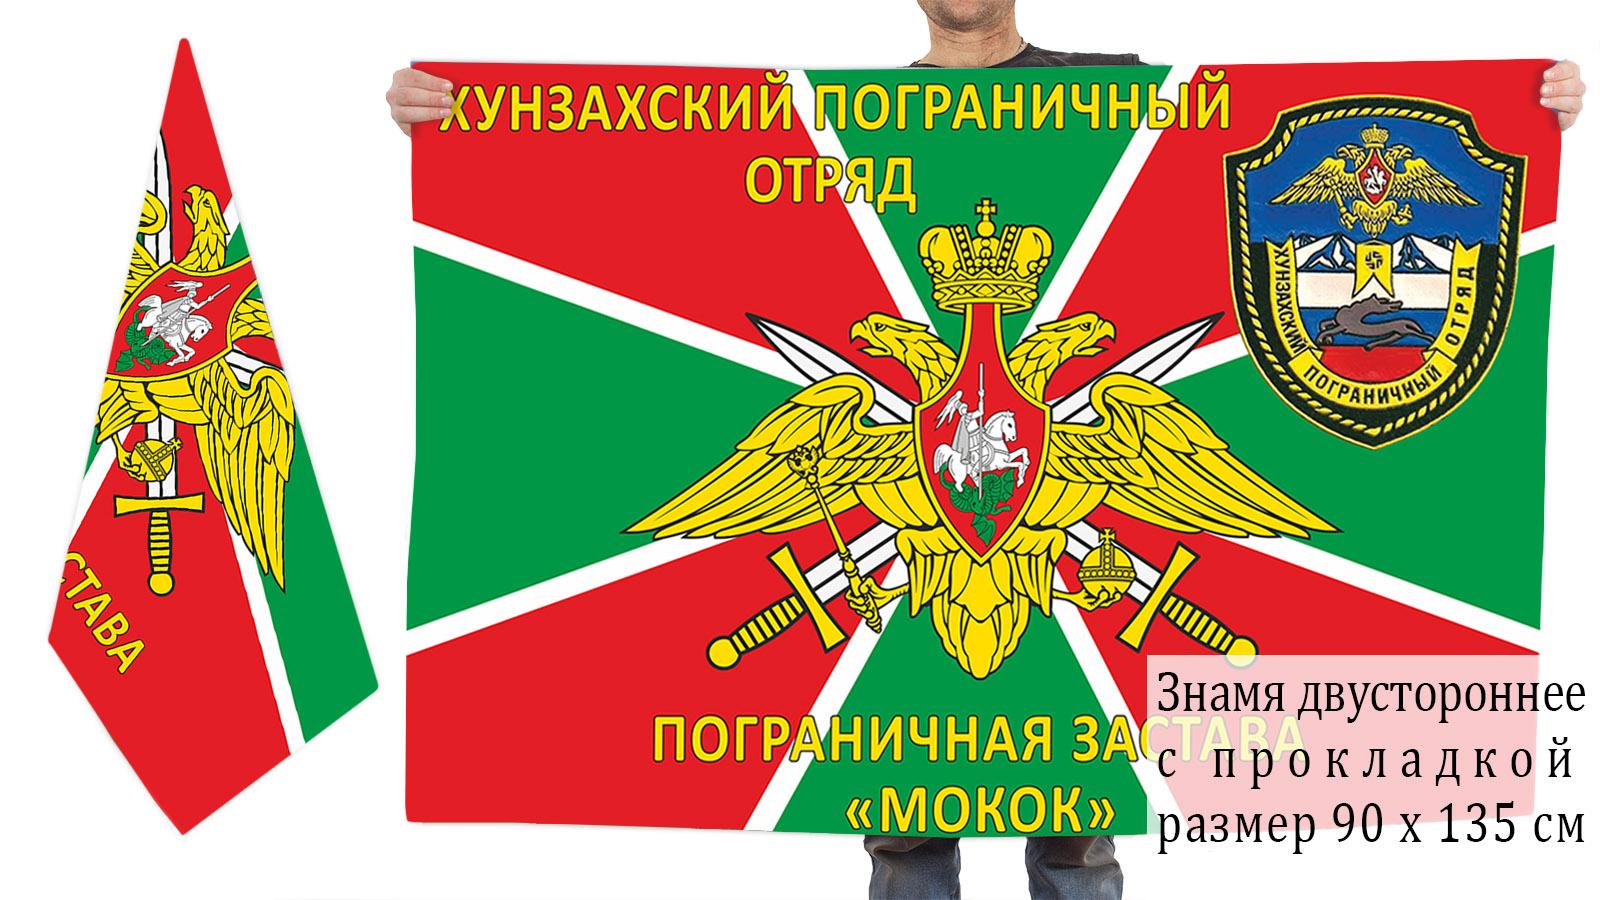 Двусторонний флаг Хунзахского пограничного отряда